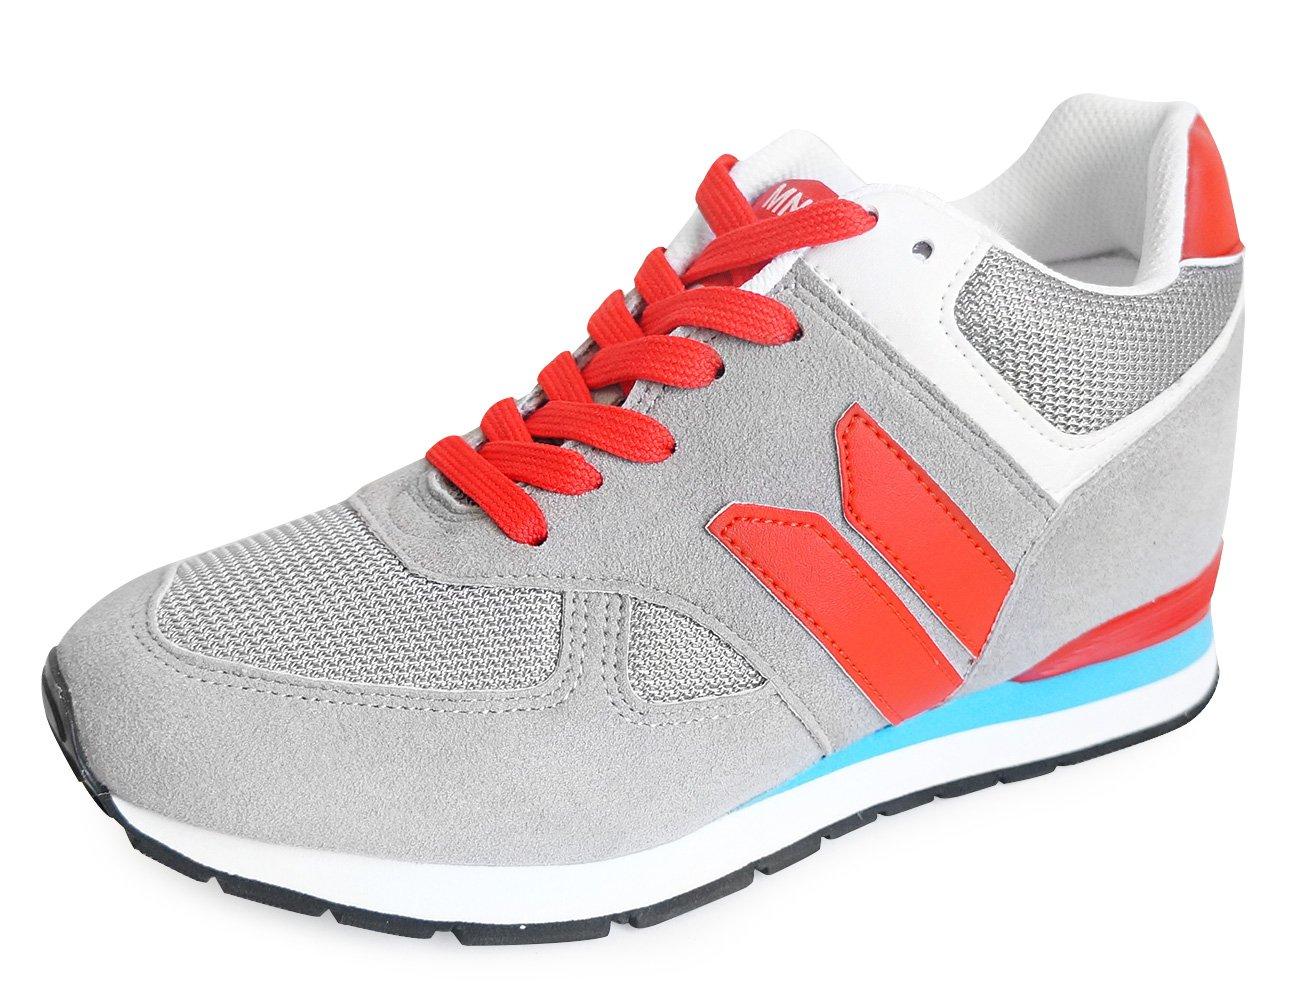 MNX15 Women's Elevator Shoes Height Increase 3.5'' ROBIN GRAY Wedge Sneakers High Heel Sneakers (8 D(M)US / 250mm(KOR), gray)